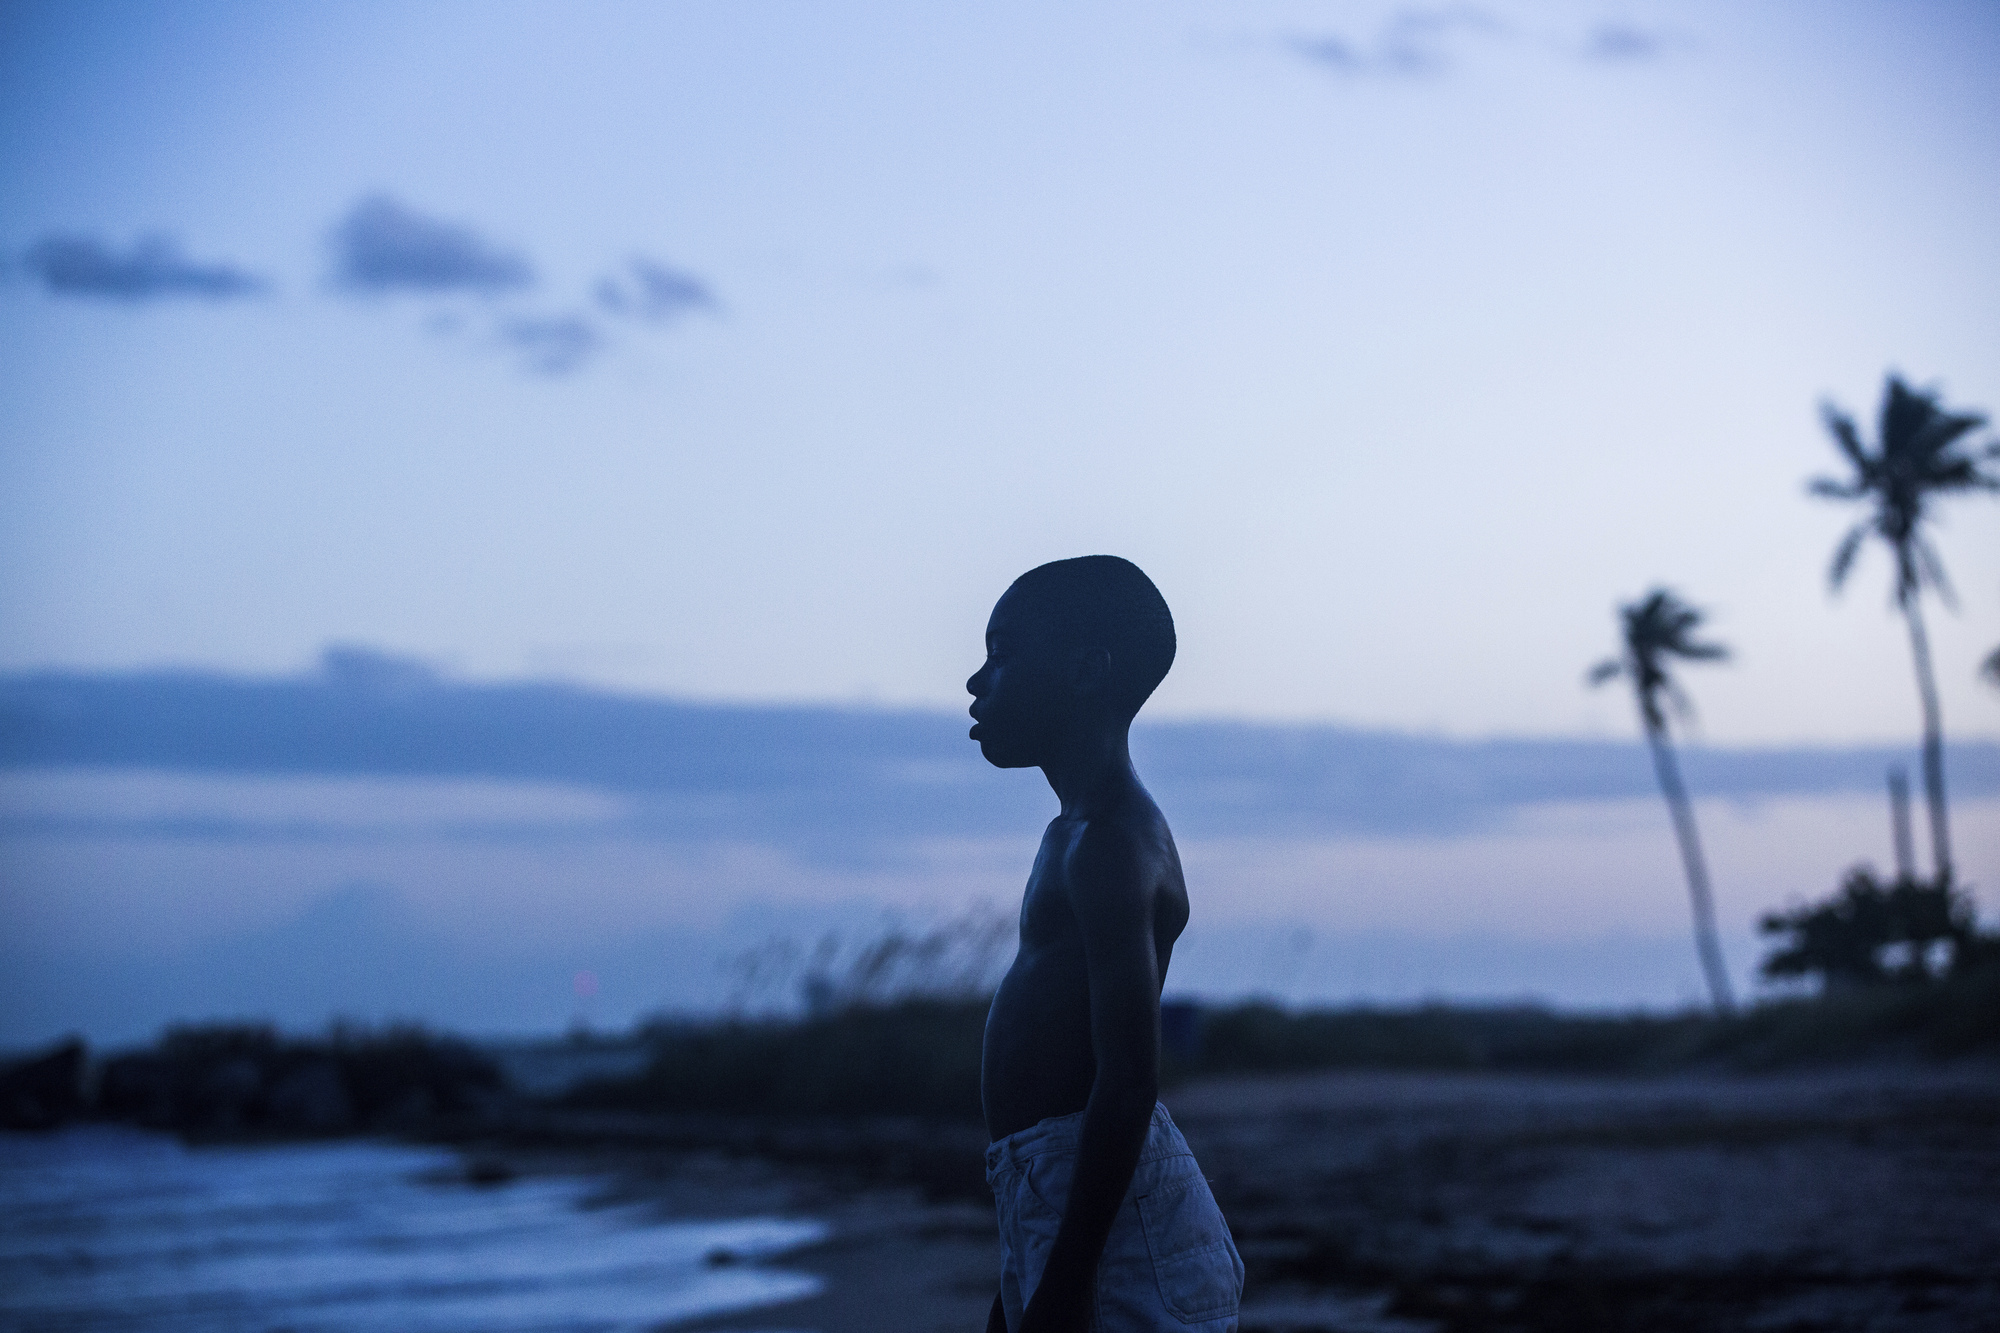 Alex Hibbert in a scene from the film, 'Moonlight.'